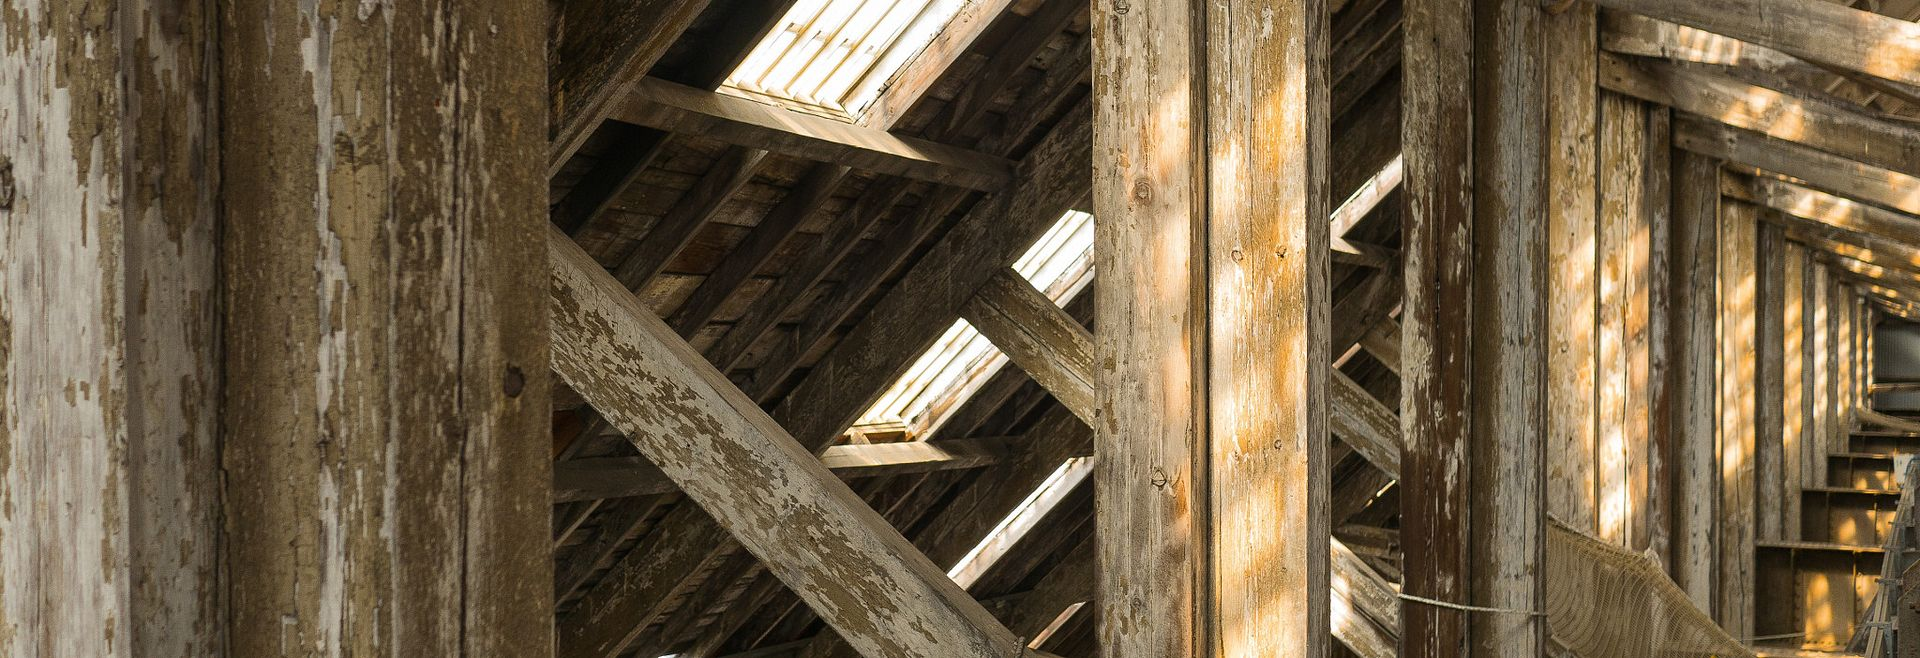 Wood attic